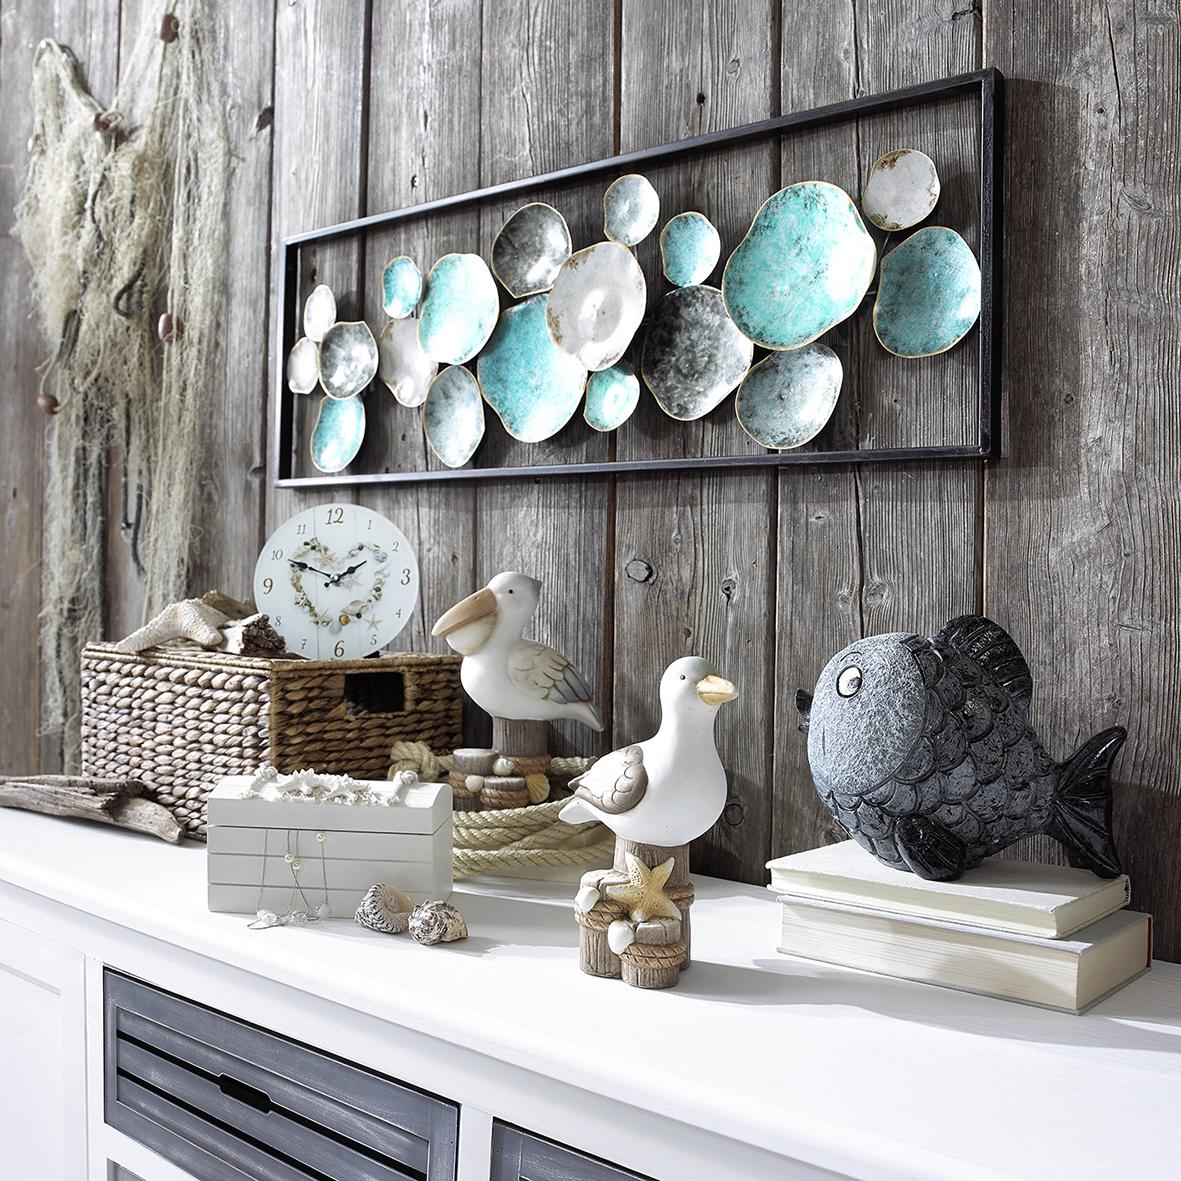 Lesnina-zidna-dekoracija-149-00-kn-domnakvadrat